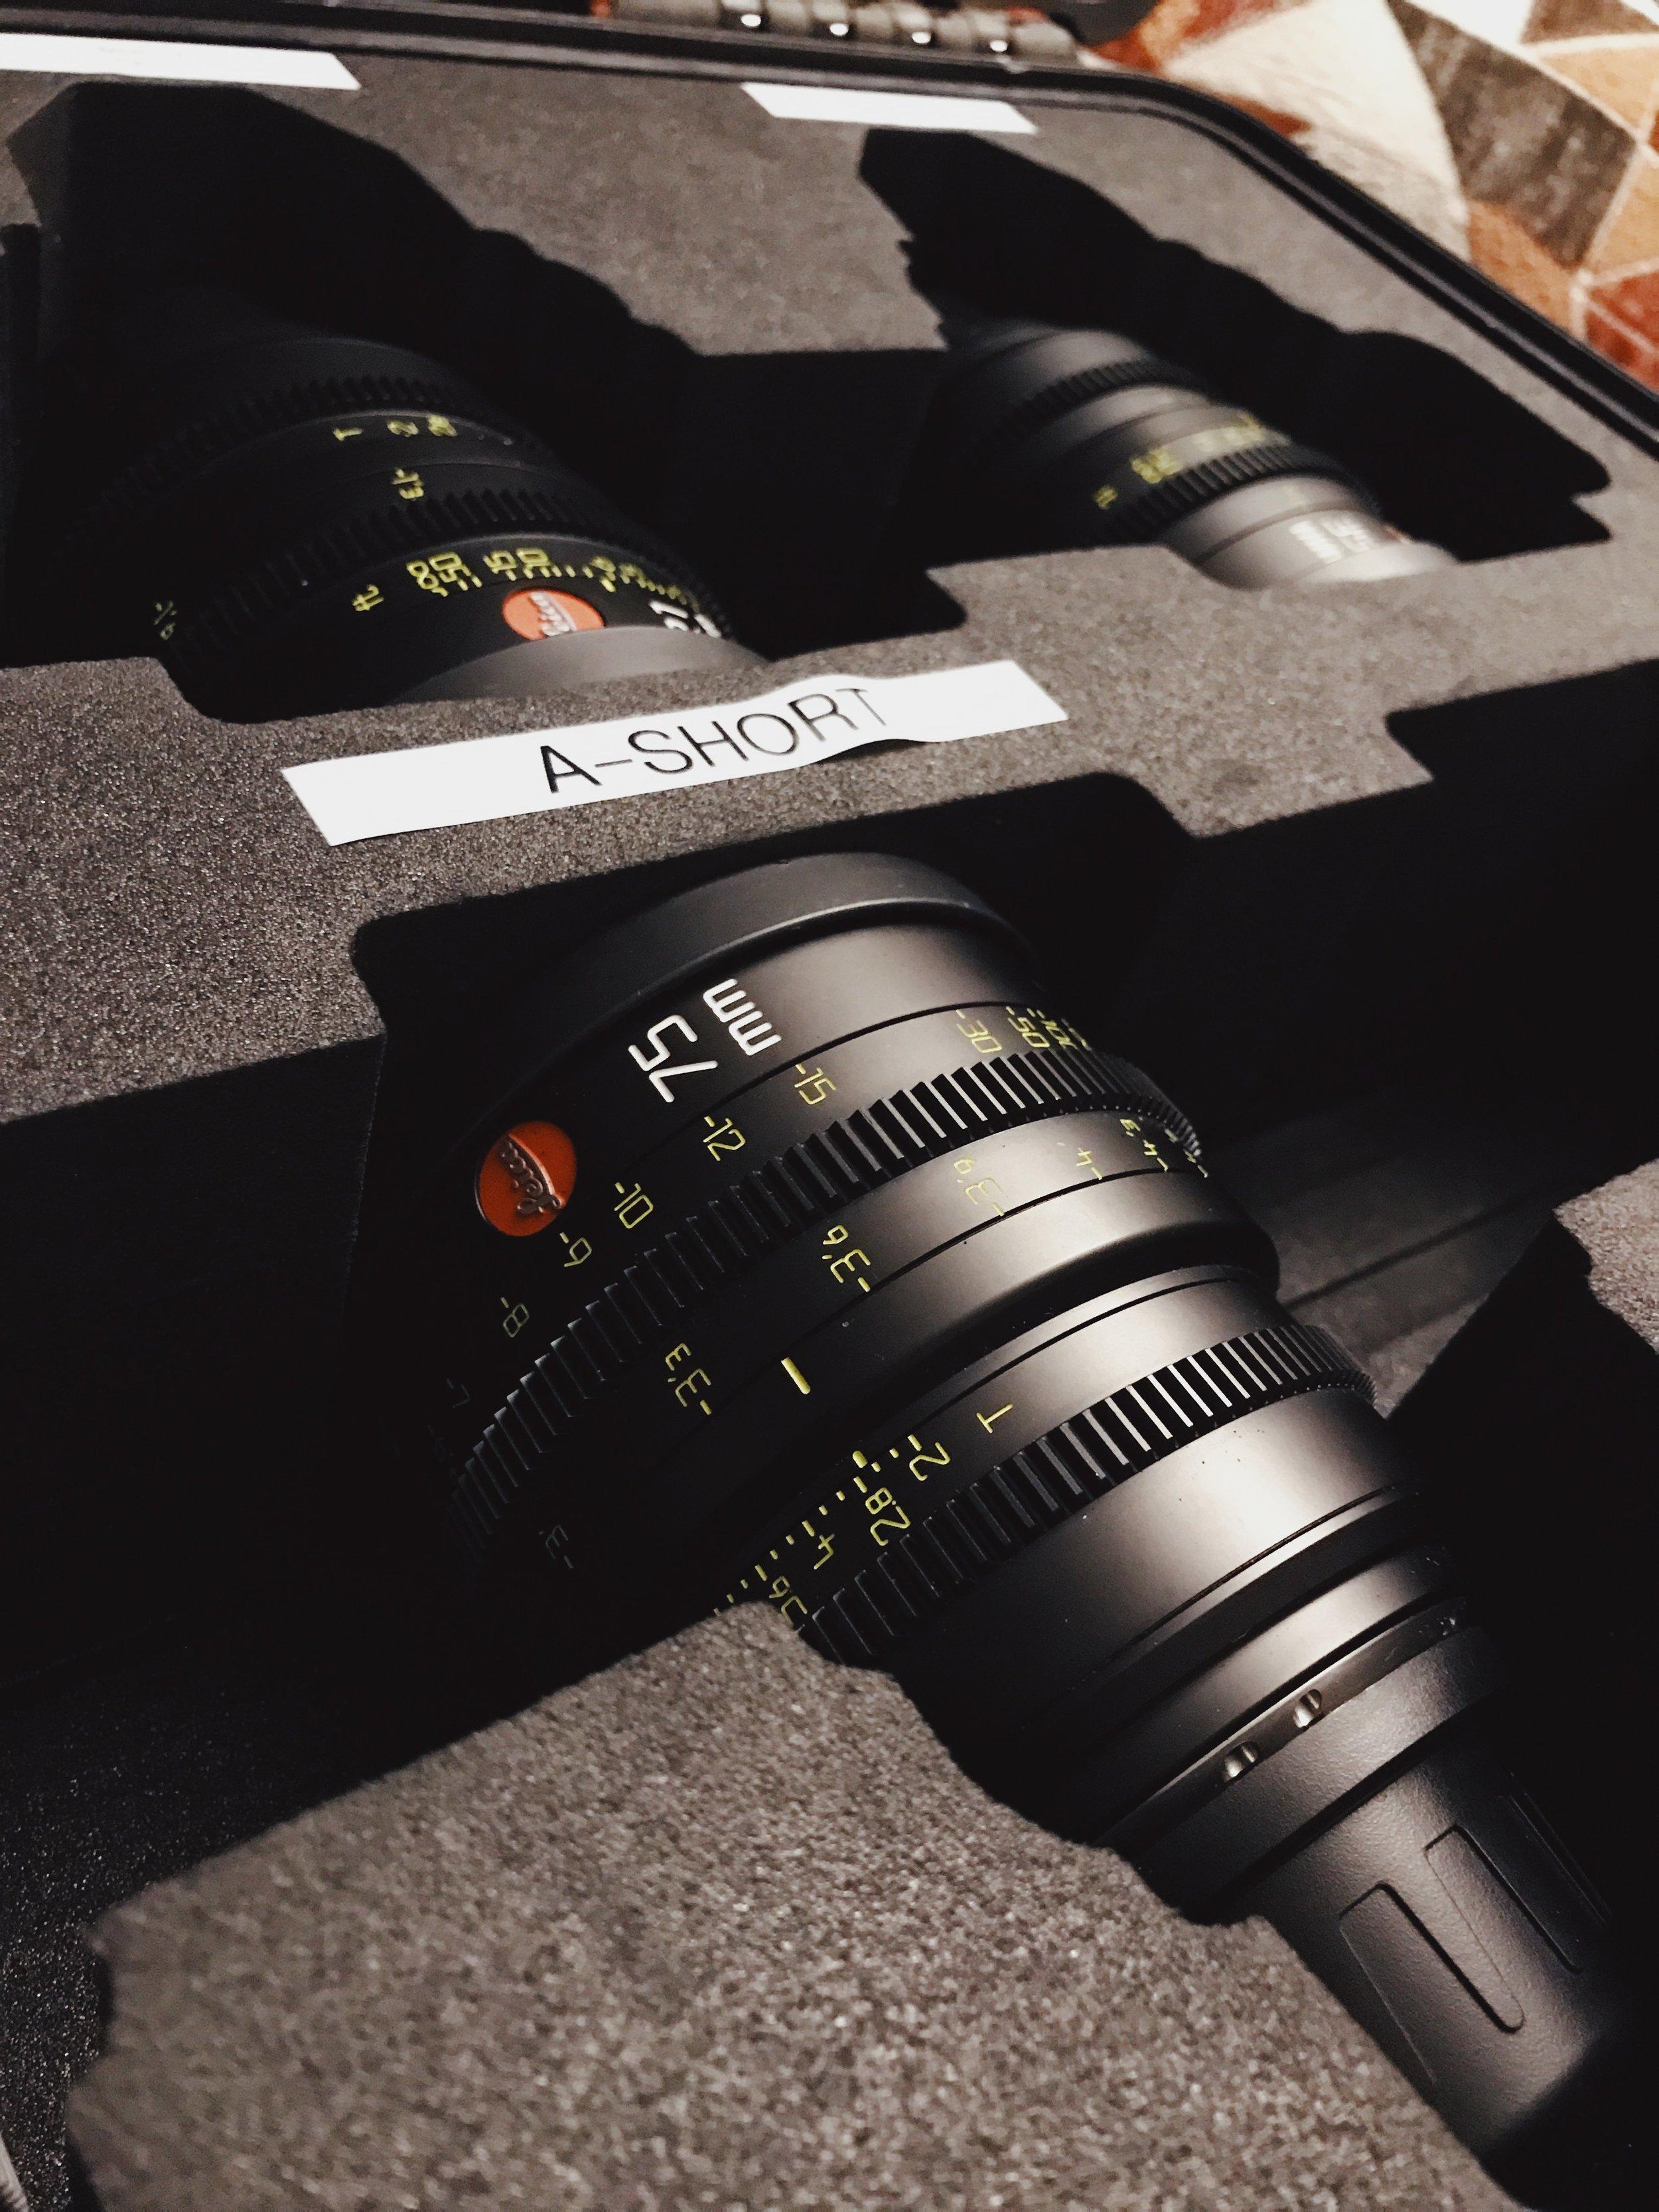 846F2FD1-99F7-4818-9AB7-F8D2C3DD54E8.jpg